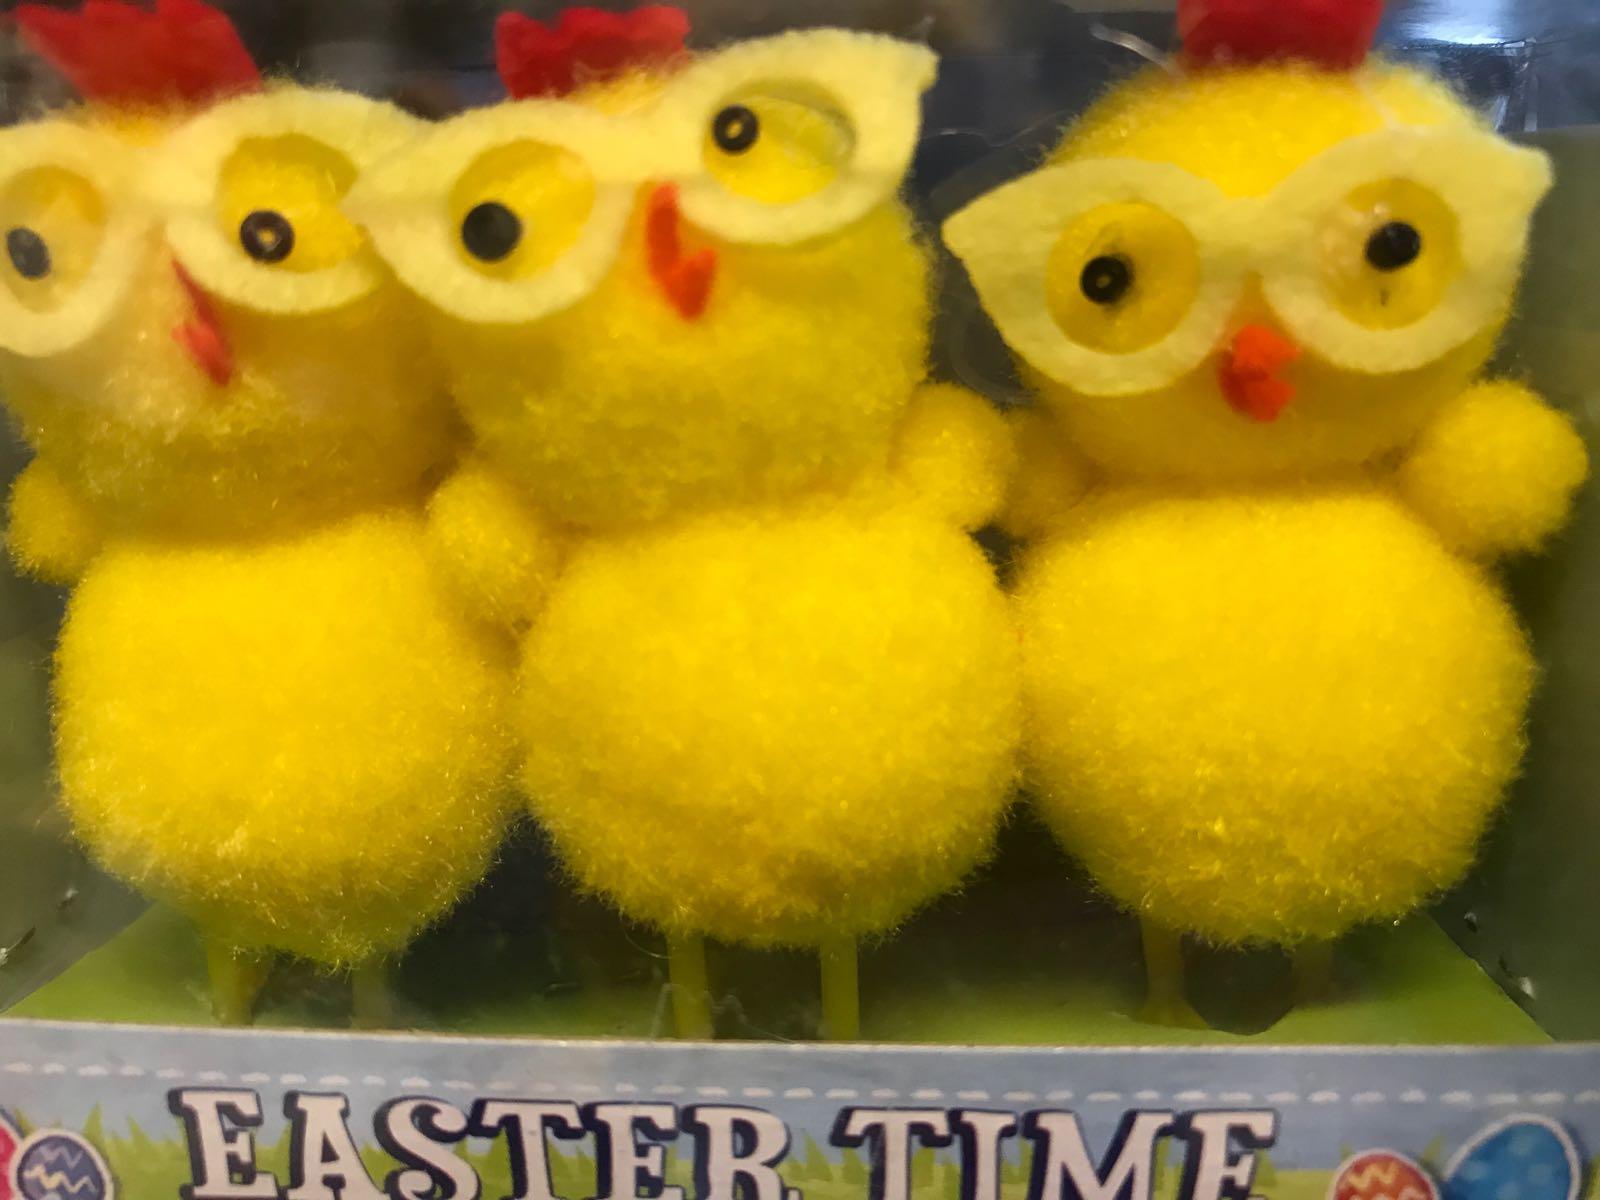 Kycklingar 3-pack